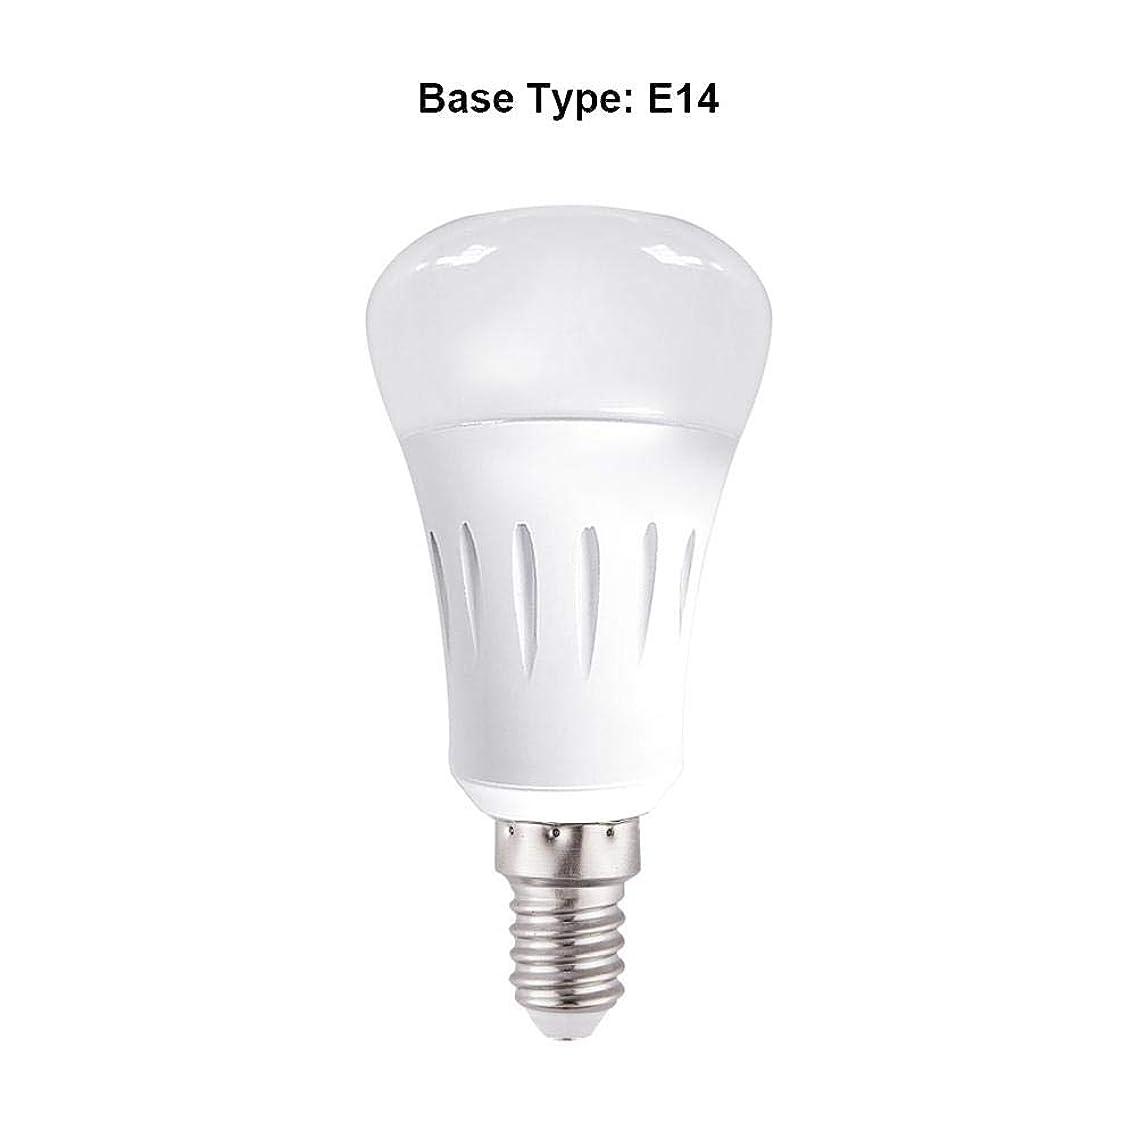 Futureshine Smart LED Light Bulb, Wi-Fi Light Bulb, Multicolored LED Light Bulbs, Dimmable, Smartphone Controlled Daylight & Night Light, Home Lighting, Compatible with Alexa